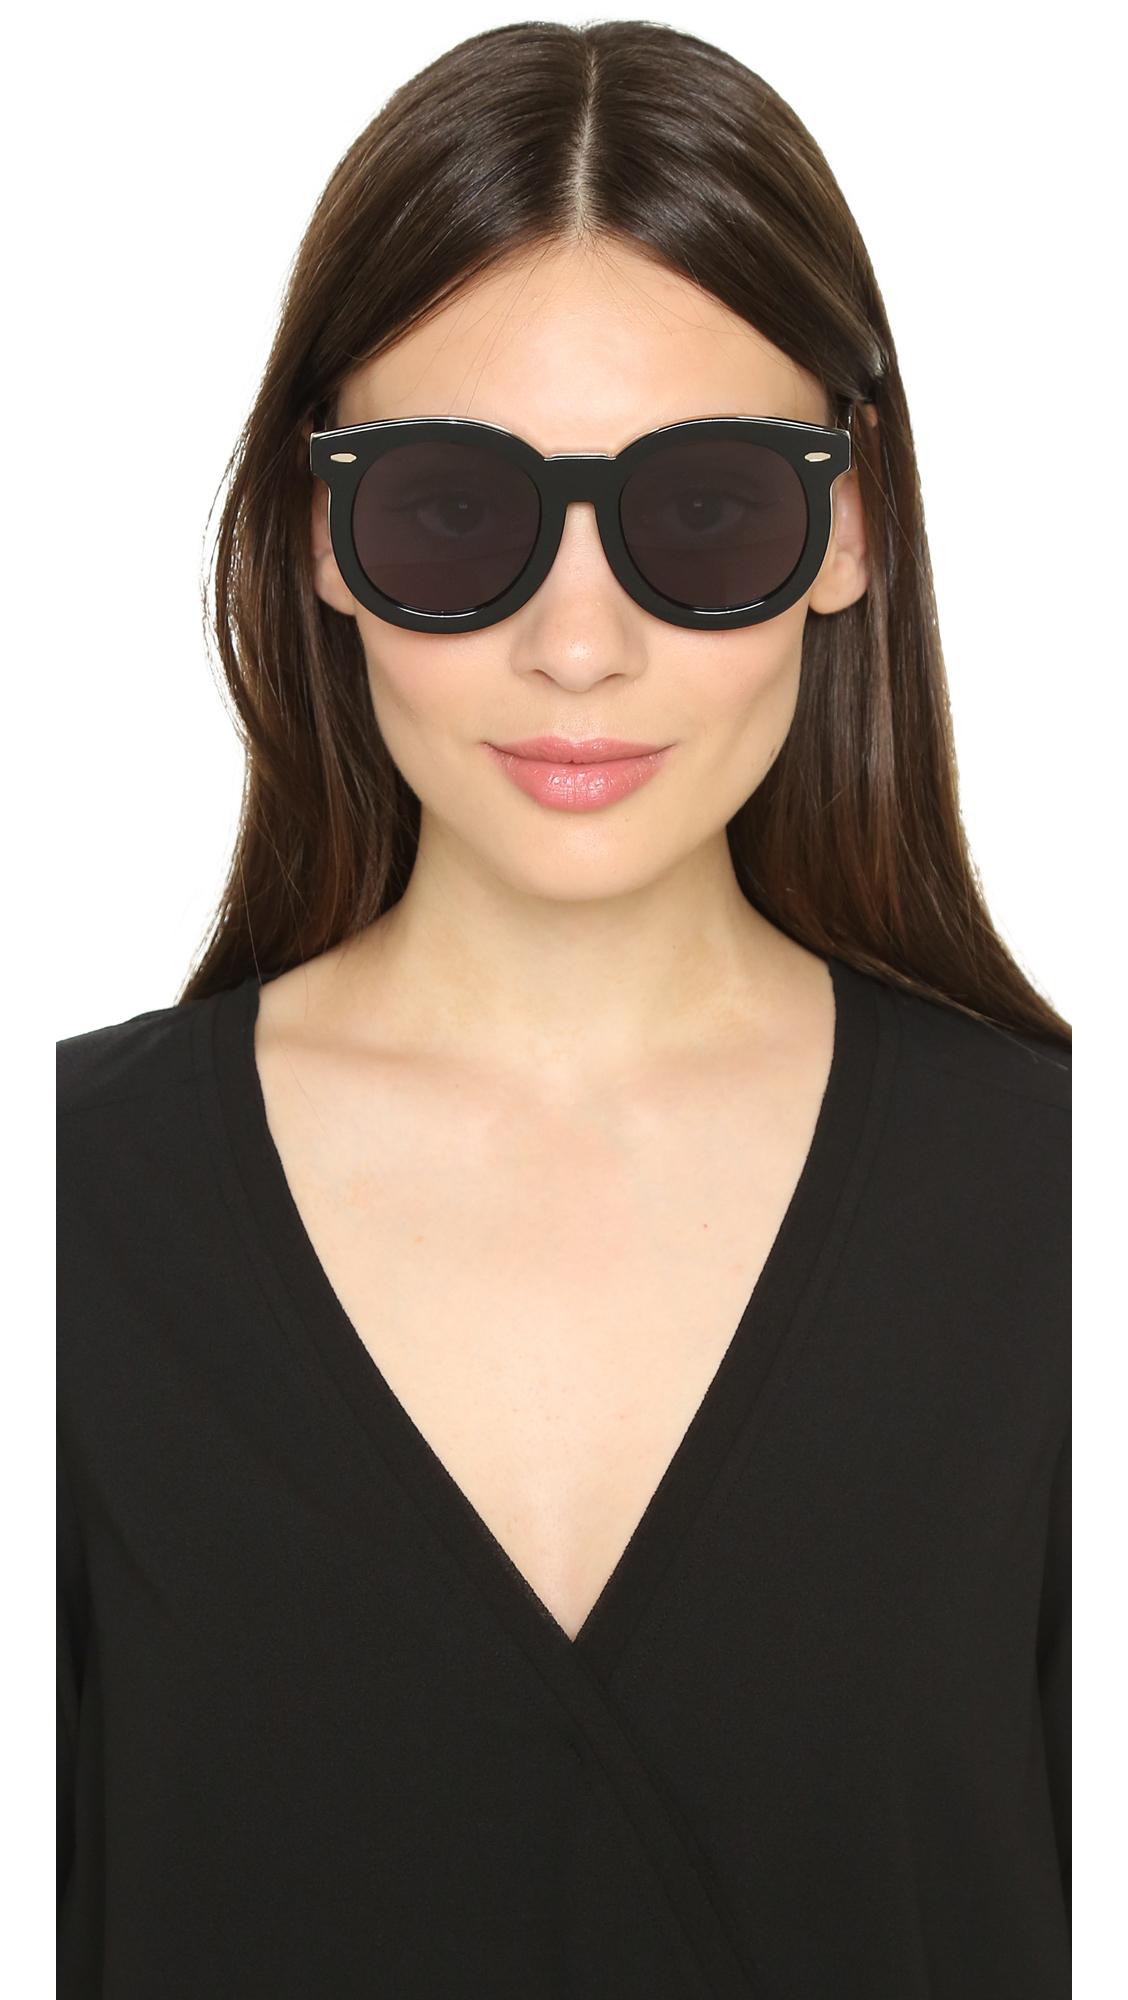 c6cd34e8b953 Lyst - Karen Walker Special Fit Super Duper Thistle Sunglasses -  Black smoke Mono in Black